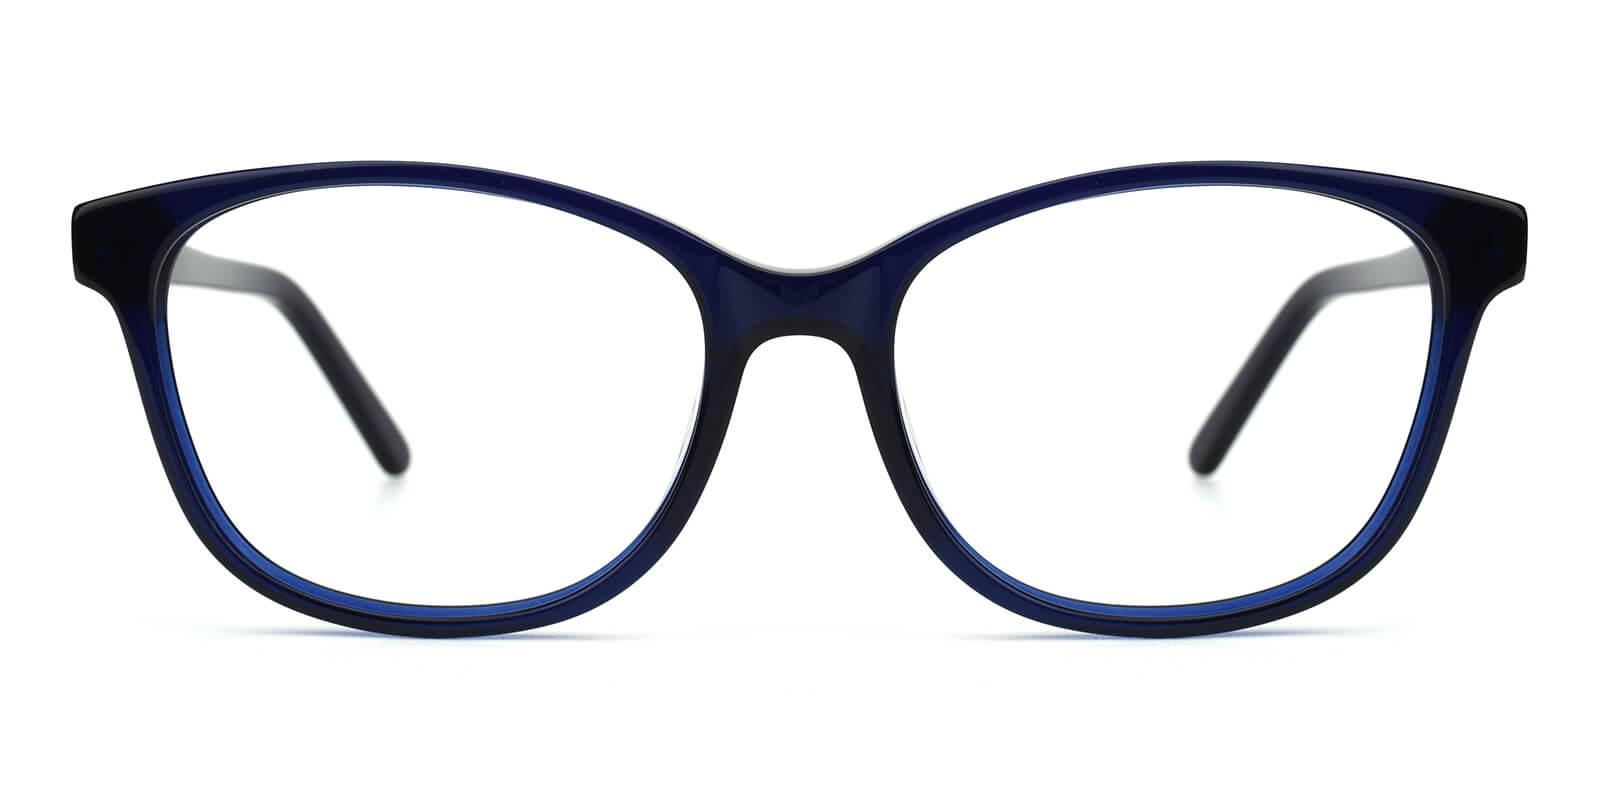 Bolivia-Blue-Cat / Rectangle-Acetate-Eyeglasses-detail